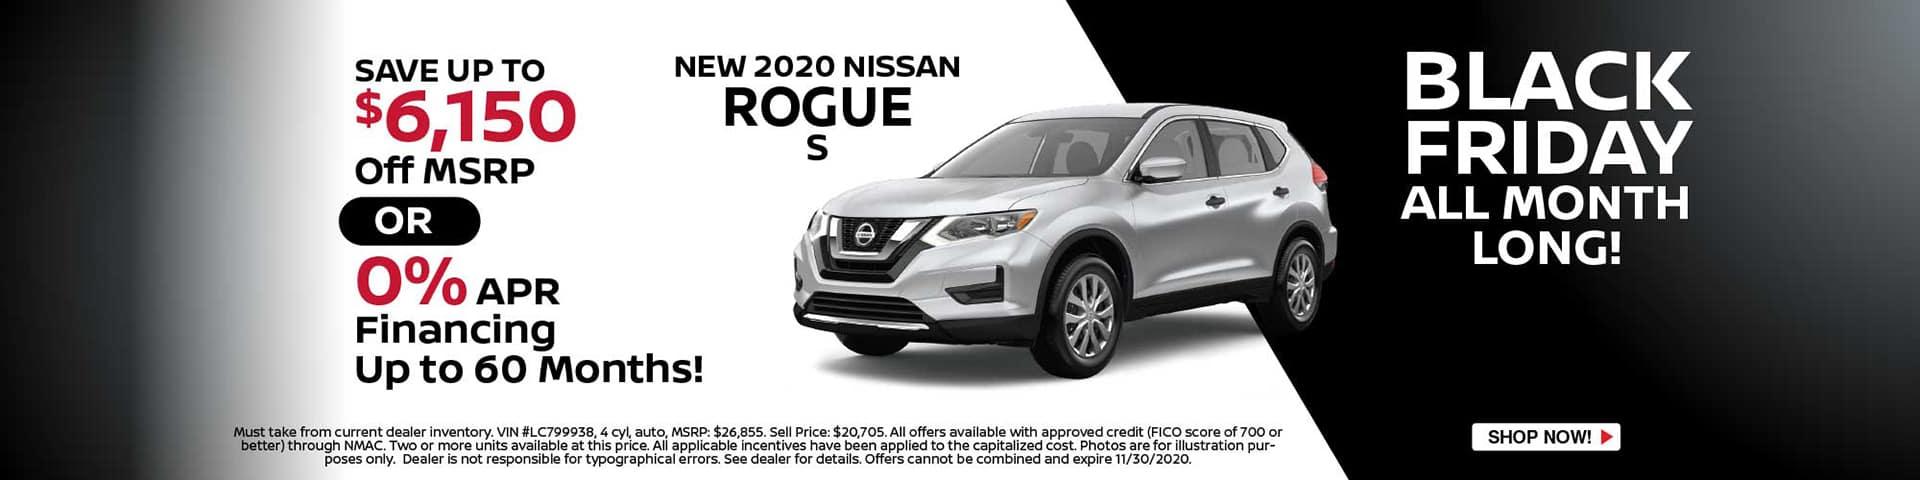 2020 Nissan Rogue